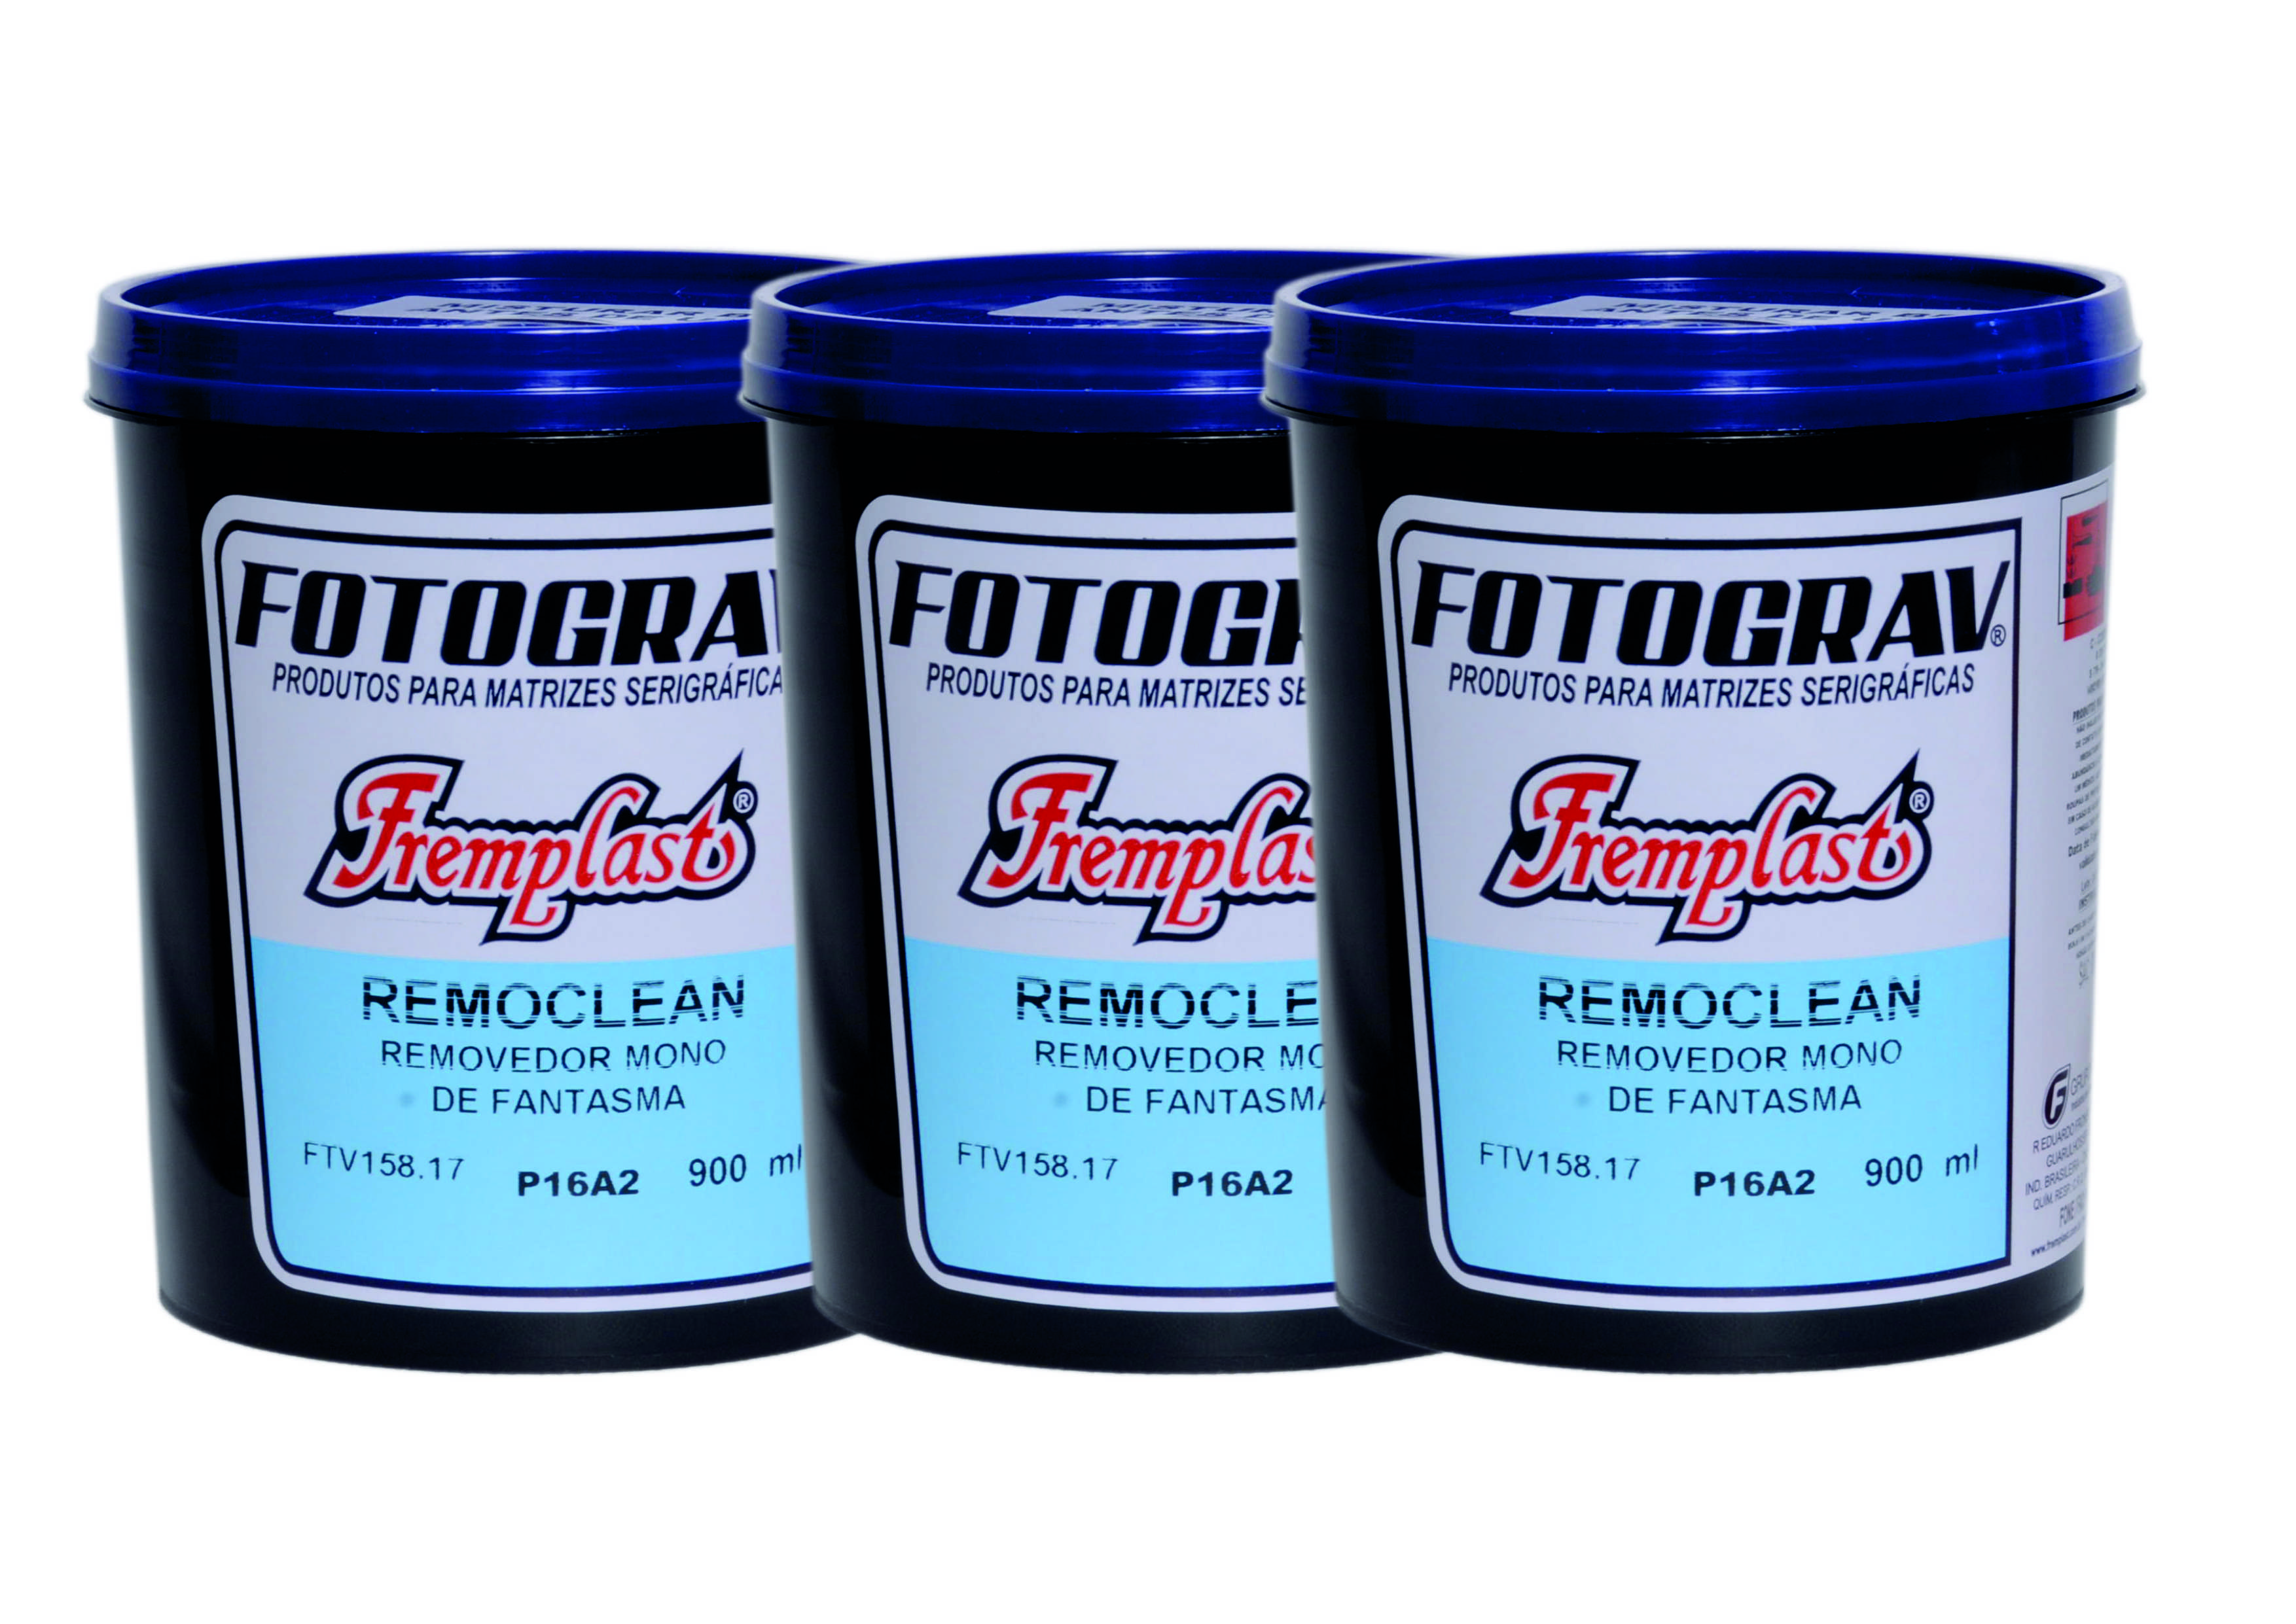 remoclean - Remoclean